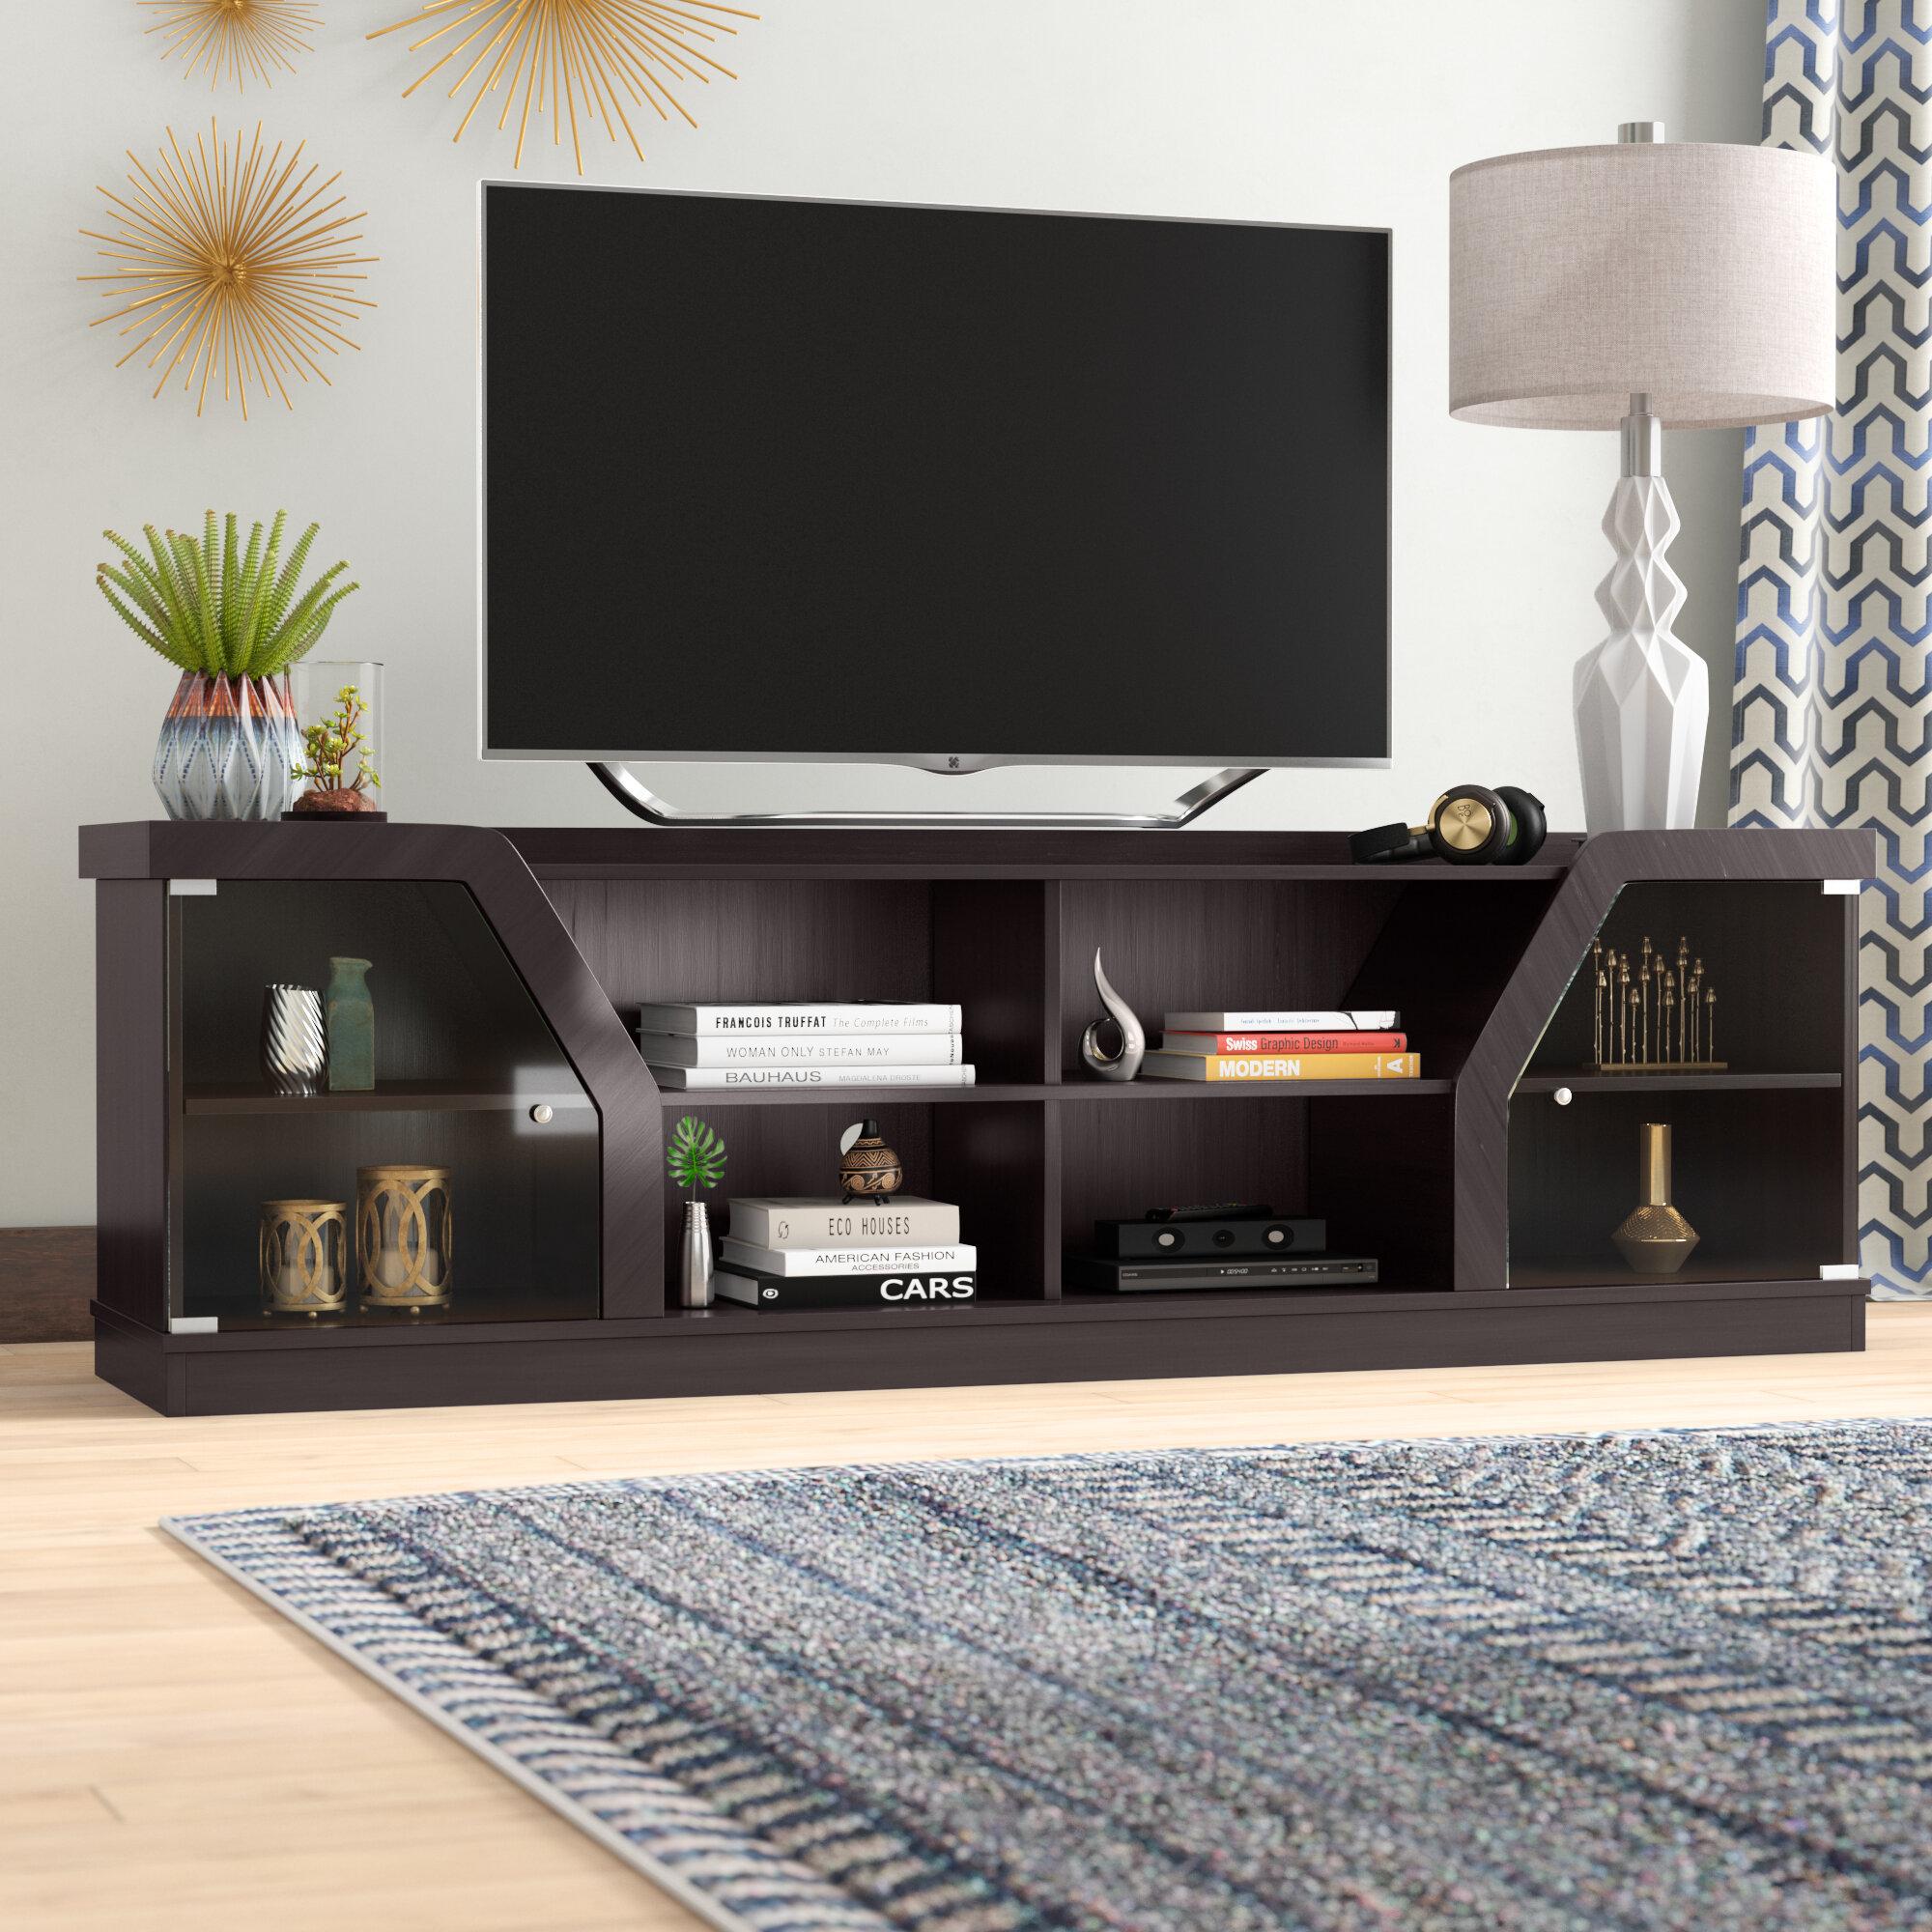 Ebern Designs Oxfordshire Tv Stand Reviews Wayfair